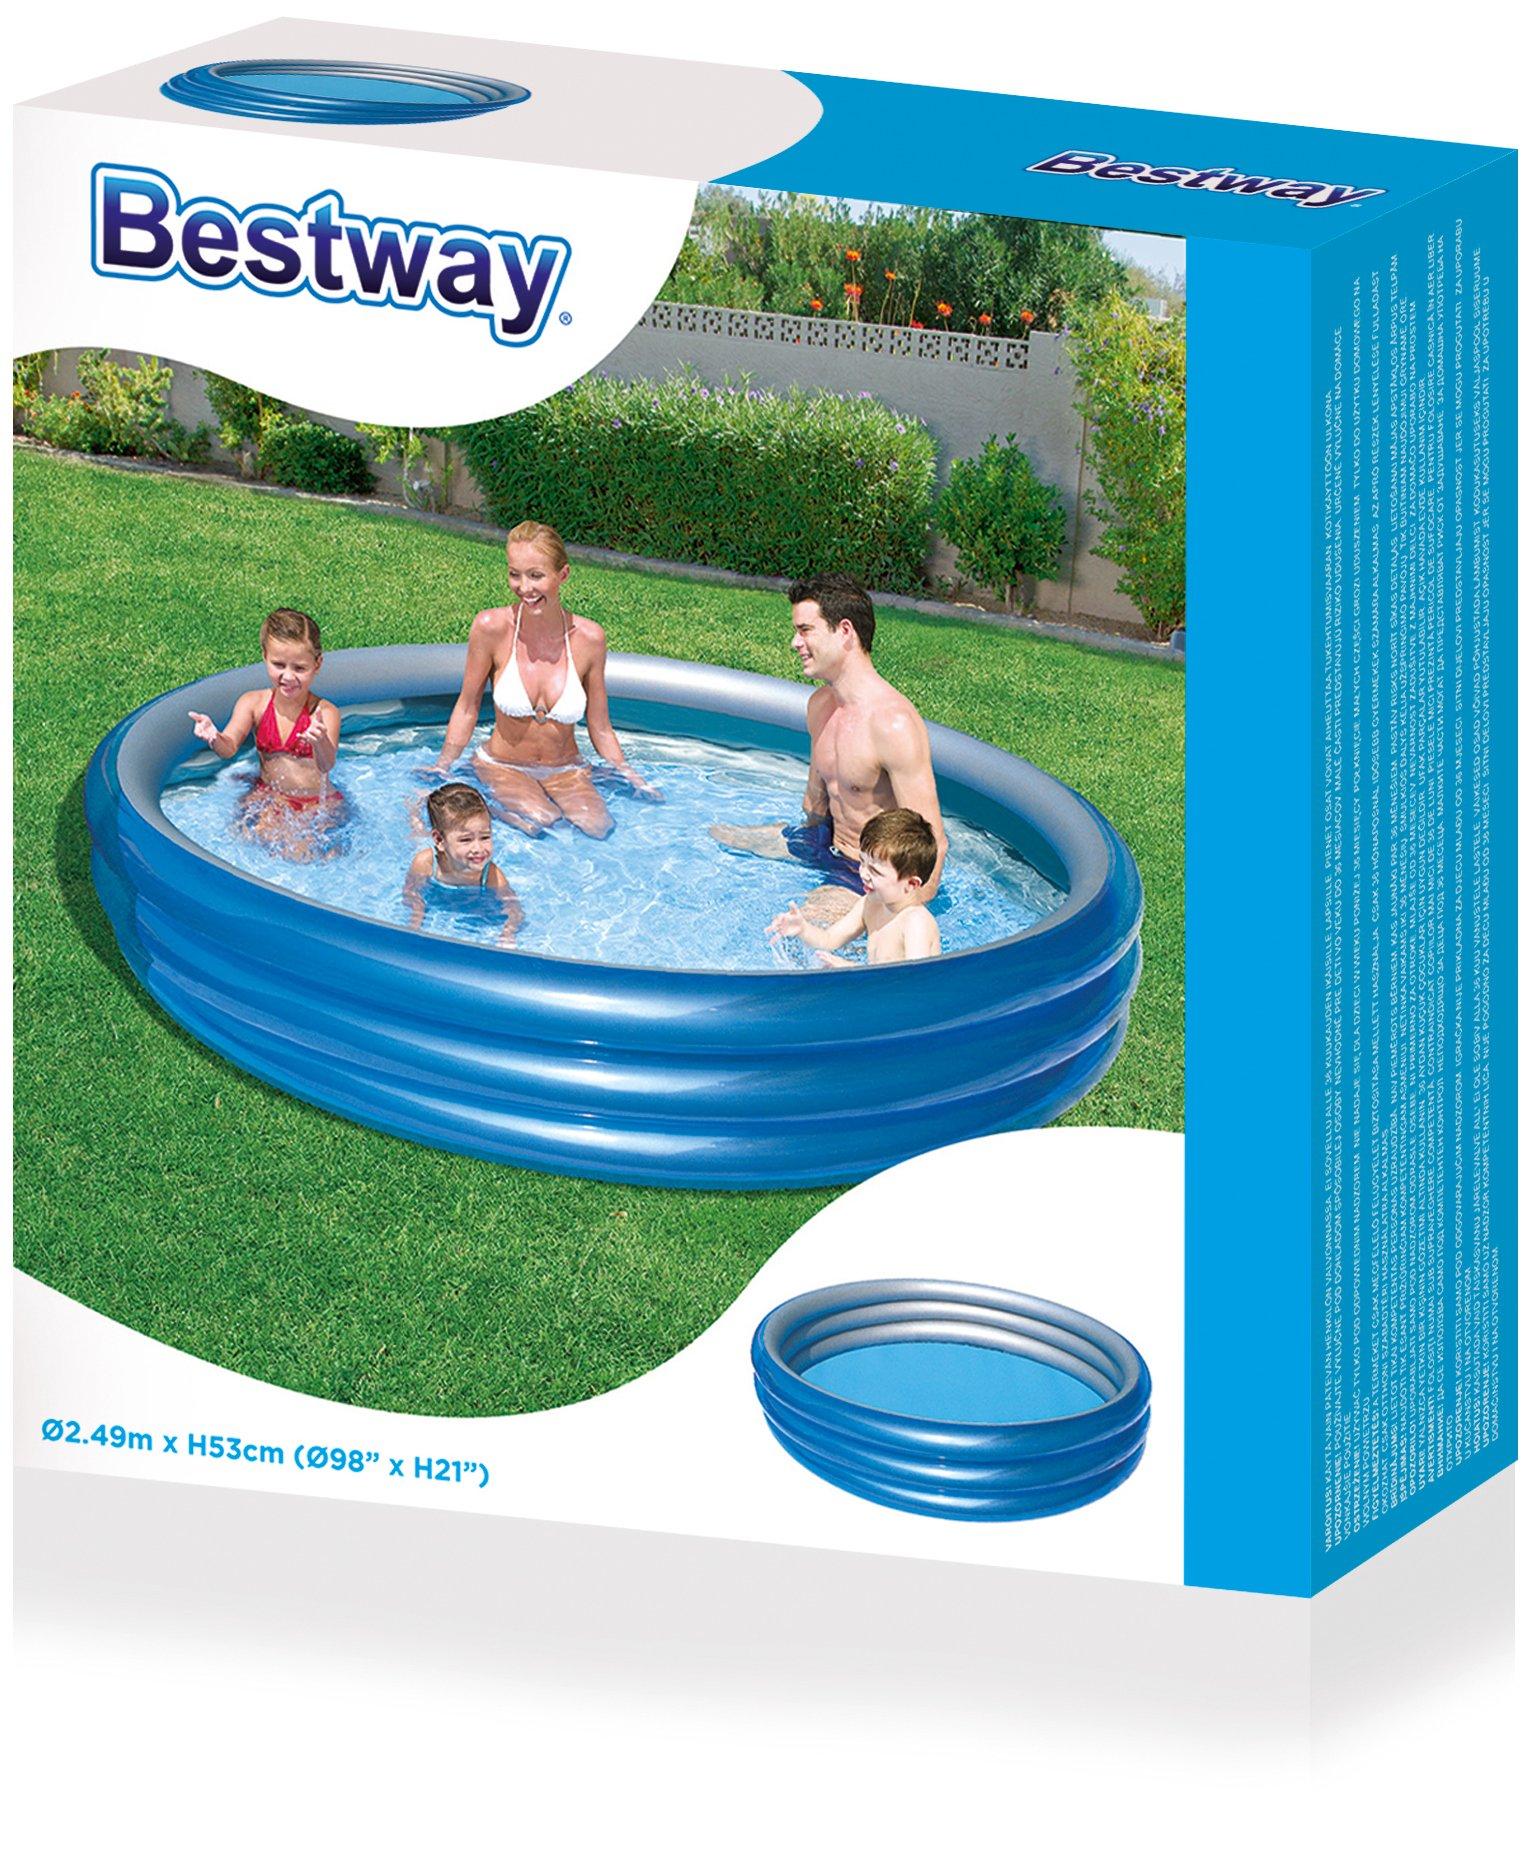 H2OGO! Big Metallic 3-Ring Inflatable Play Pool by Bestway (Image #4)